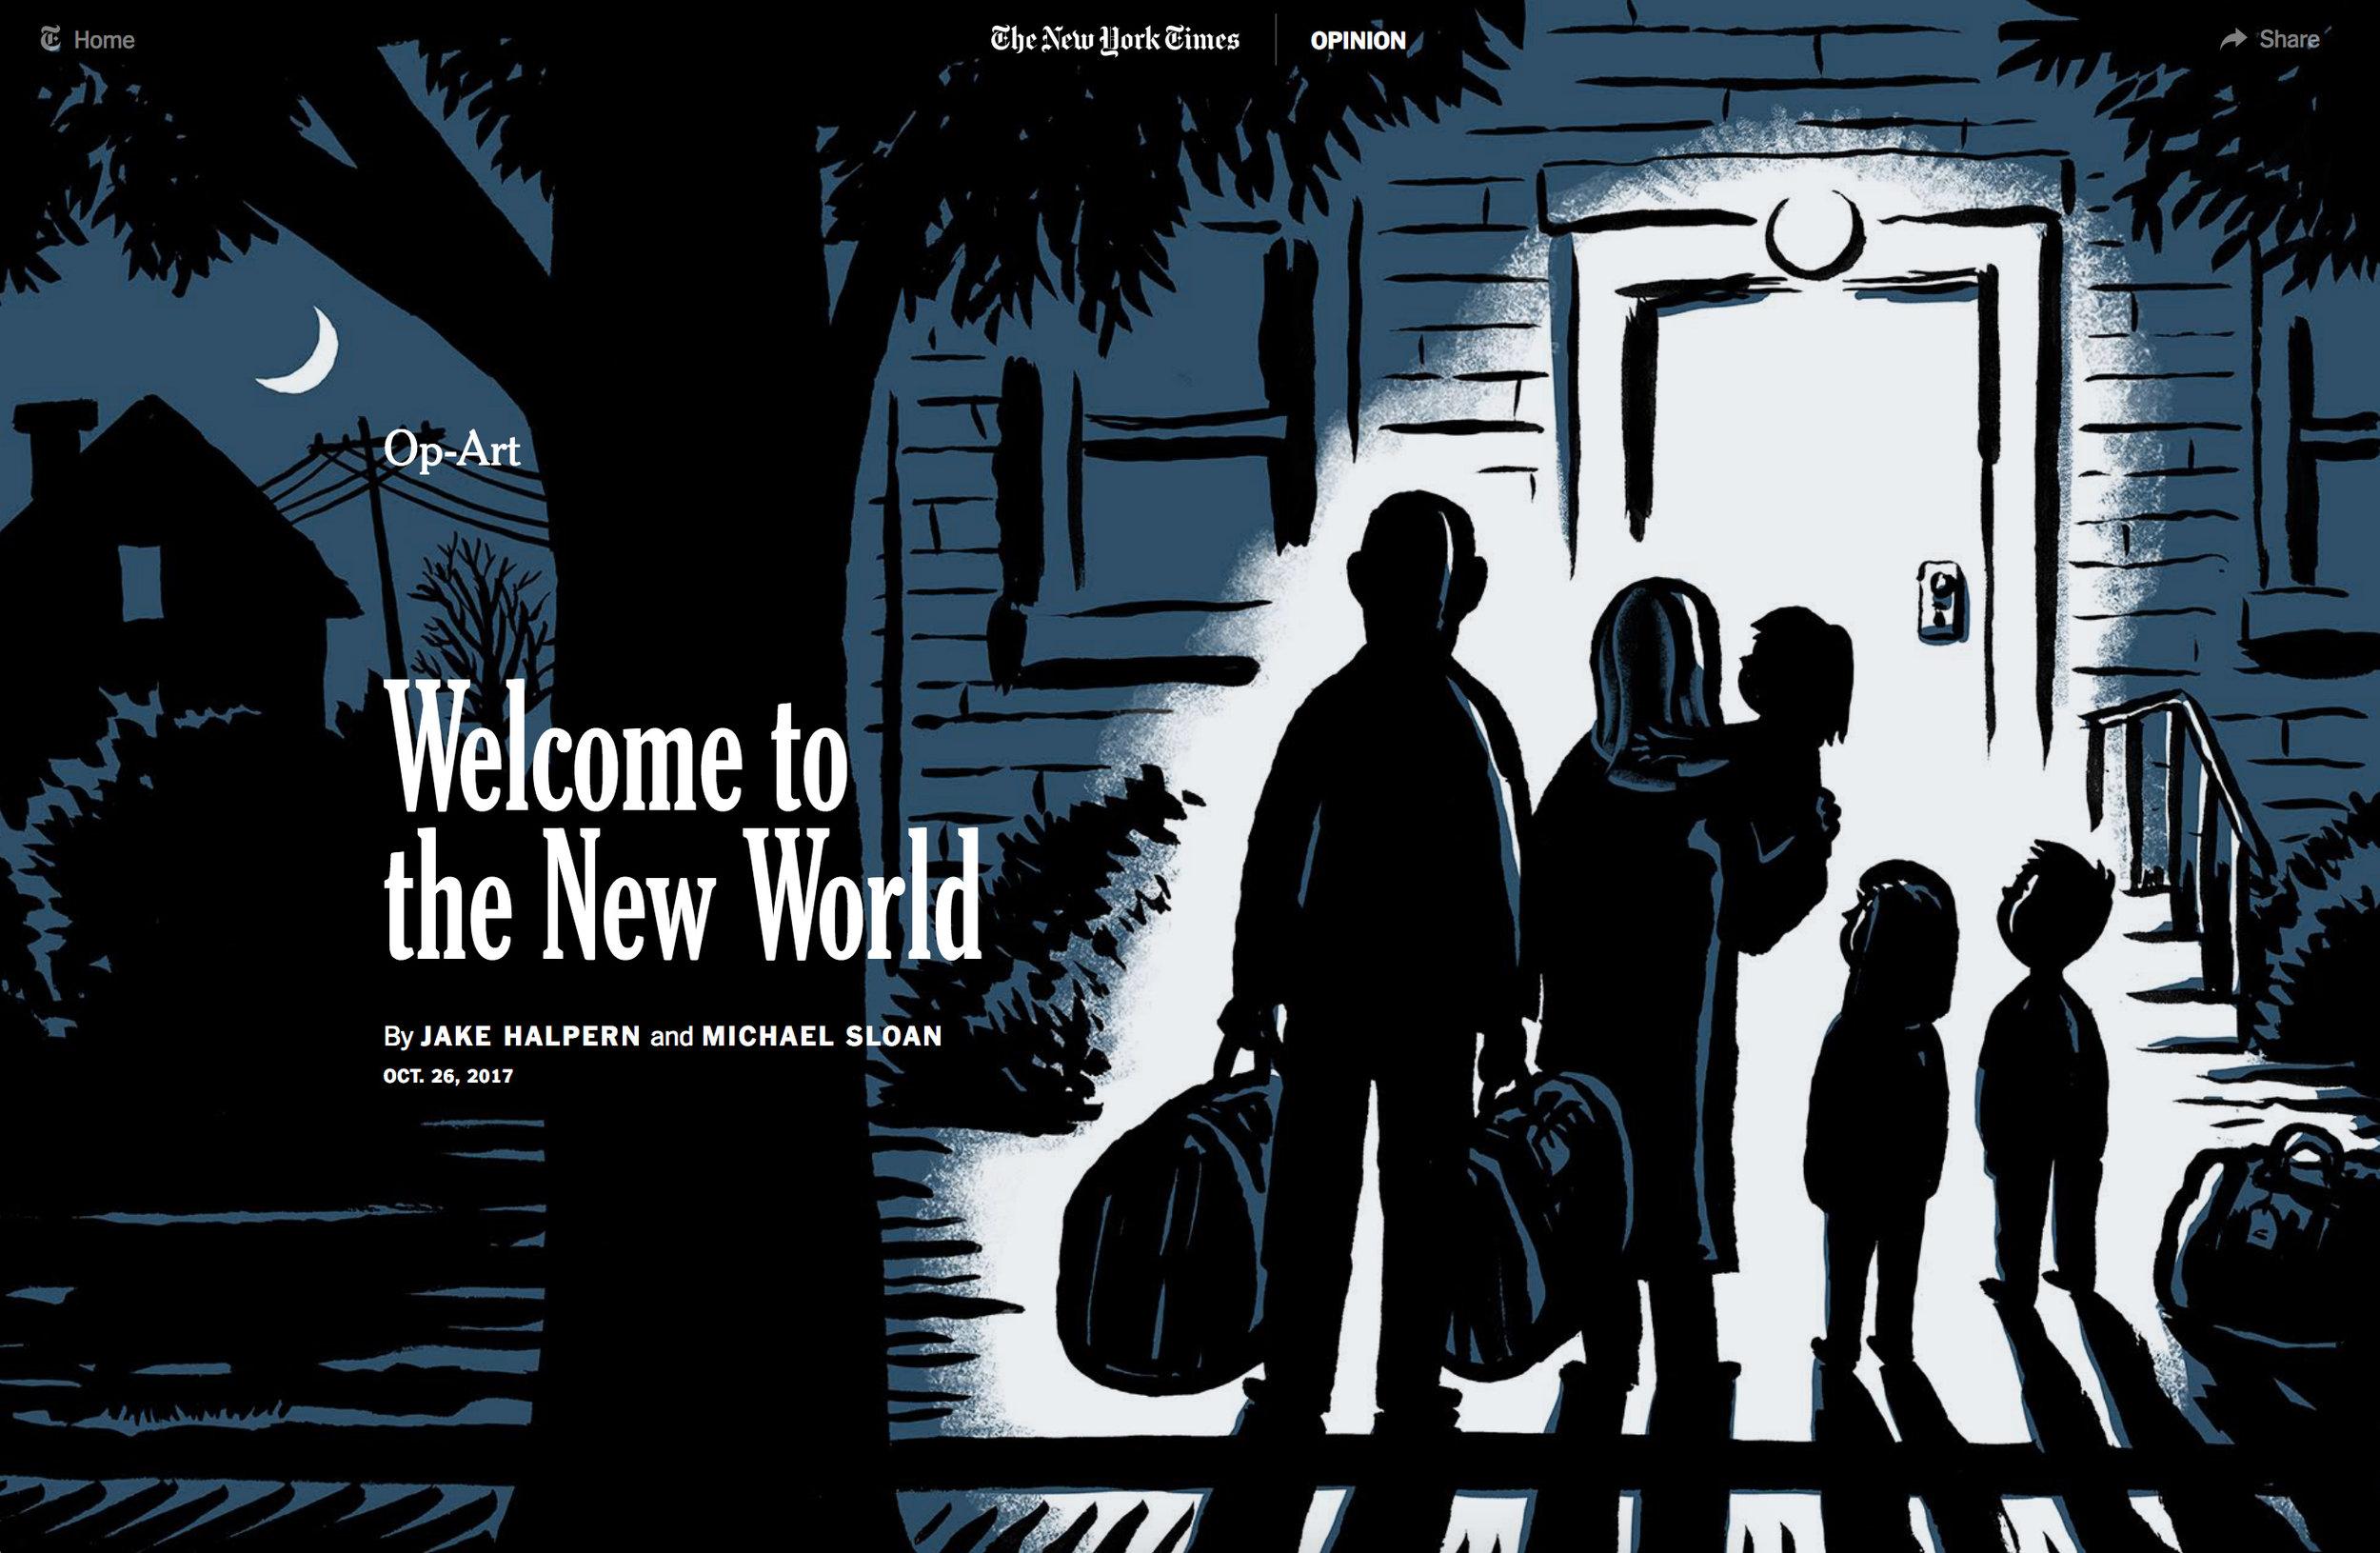 newworldbanner2.jpg